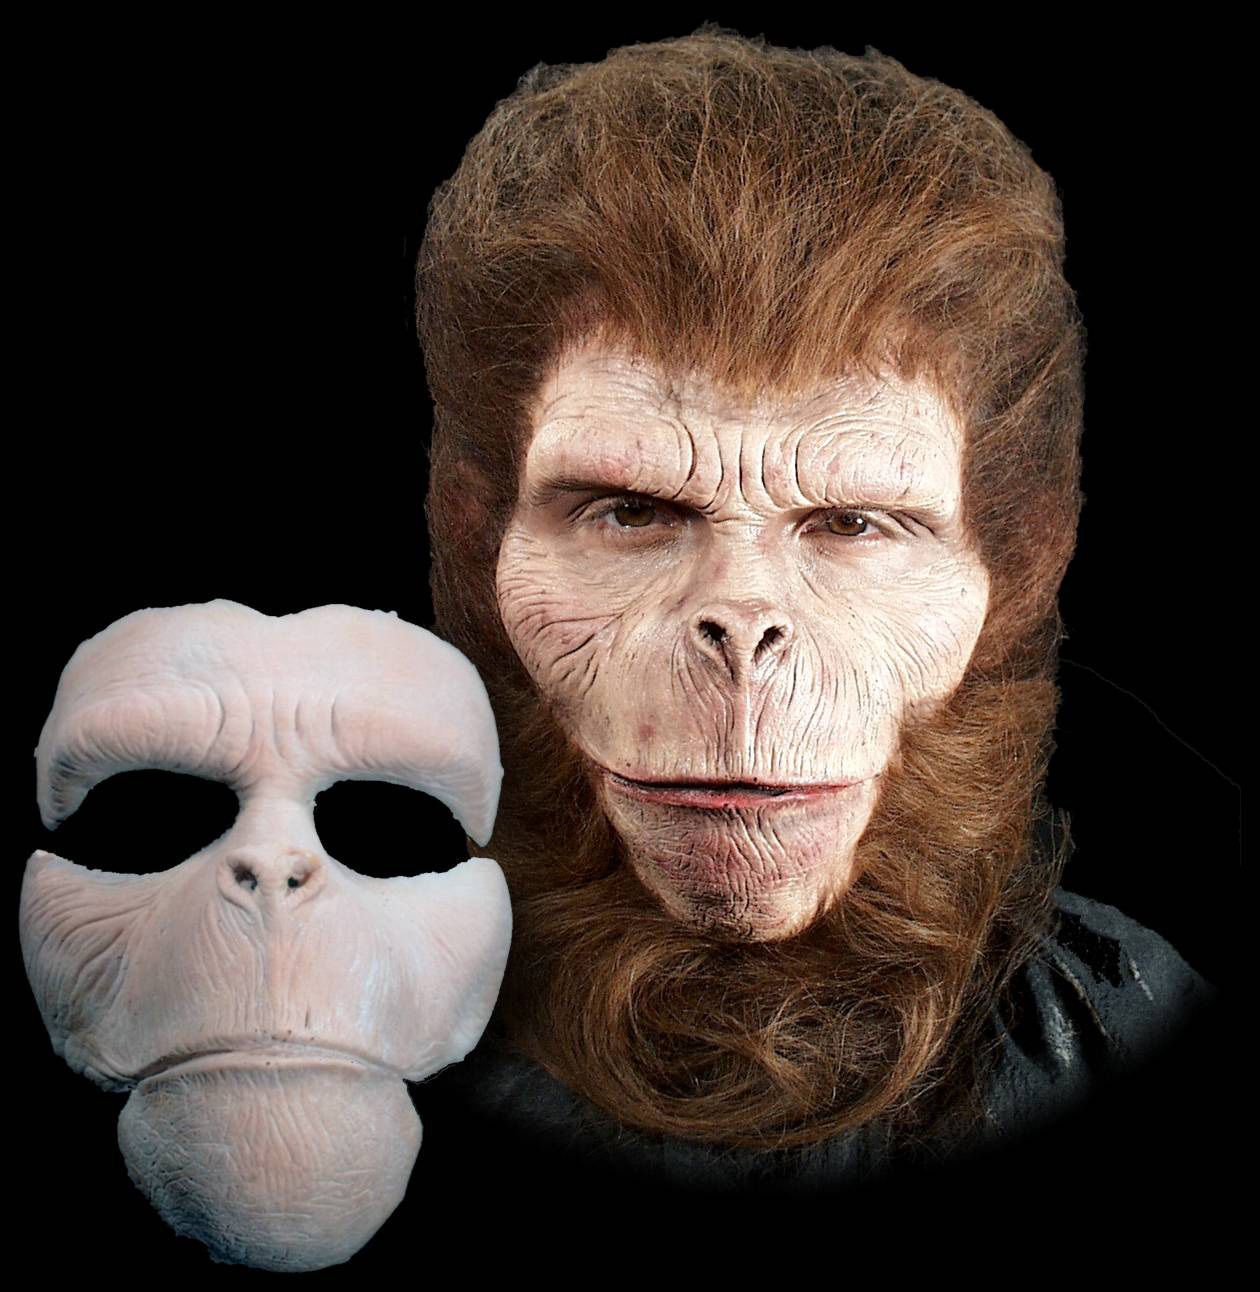 Chimpanzee Ape Halloween Mask Foam Latex Prosthetic Appliance ...